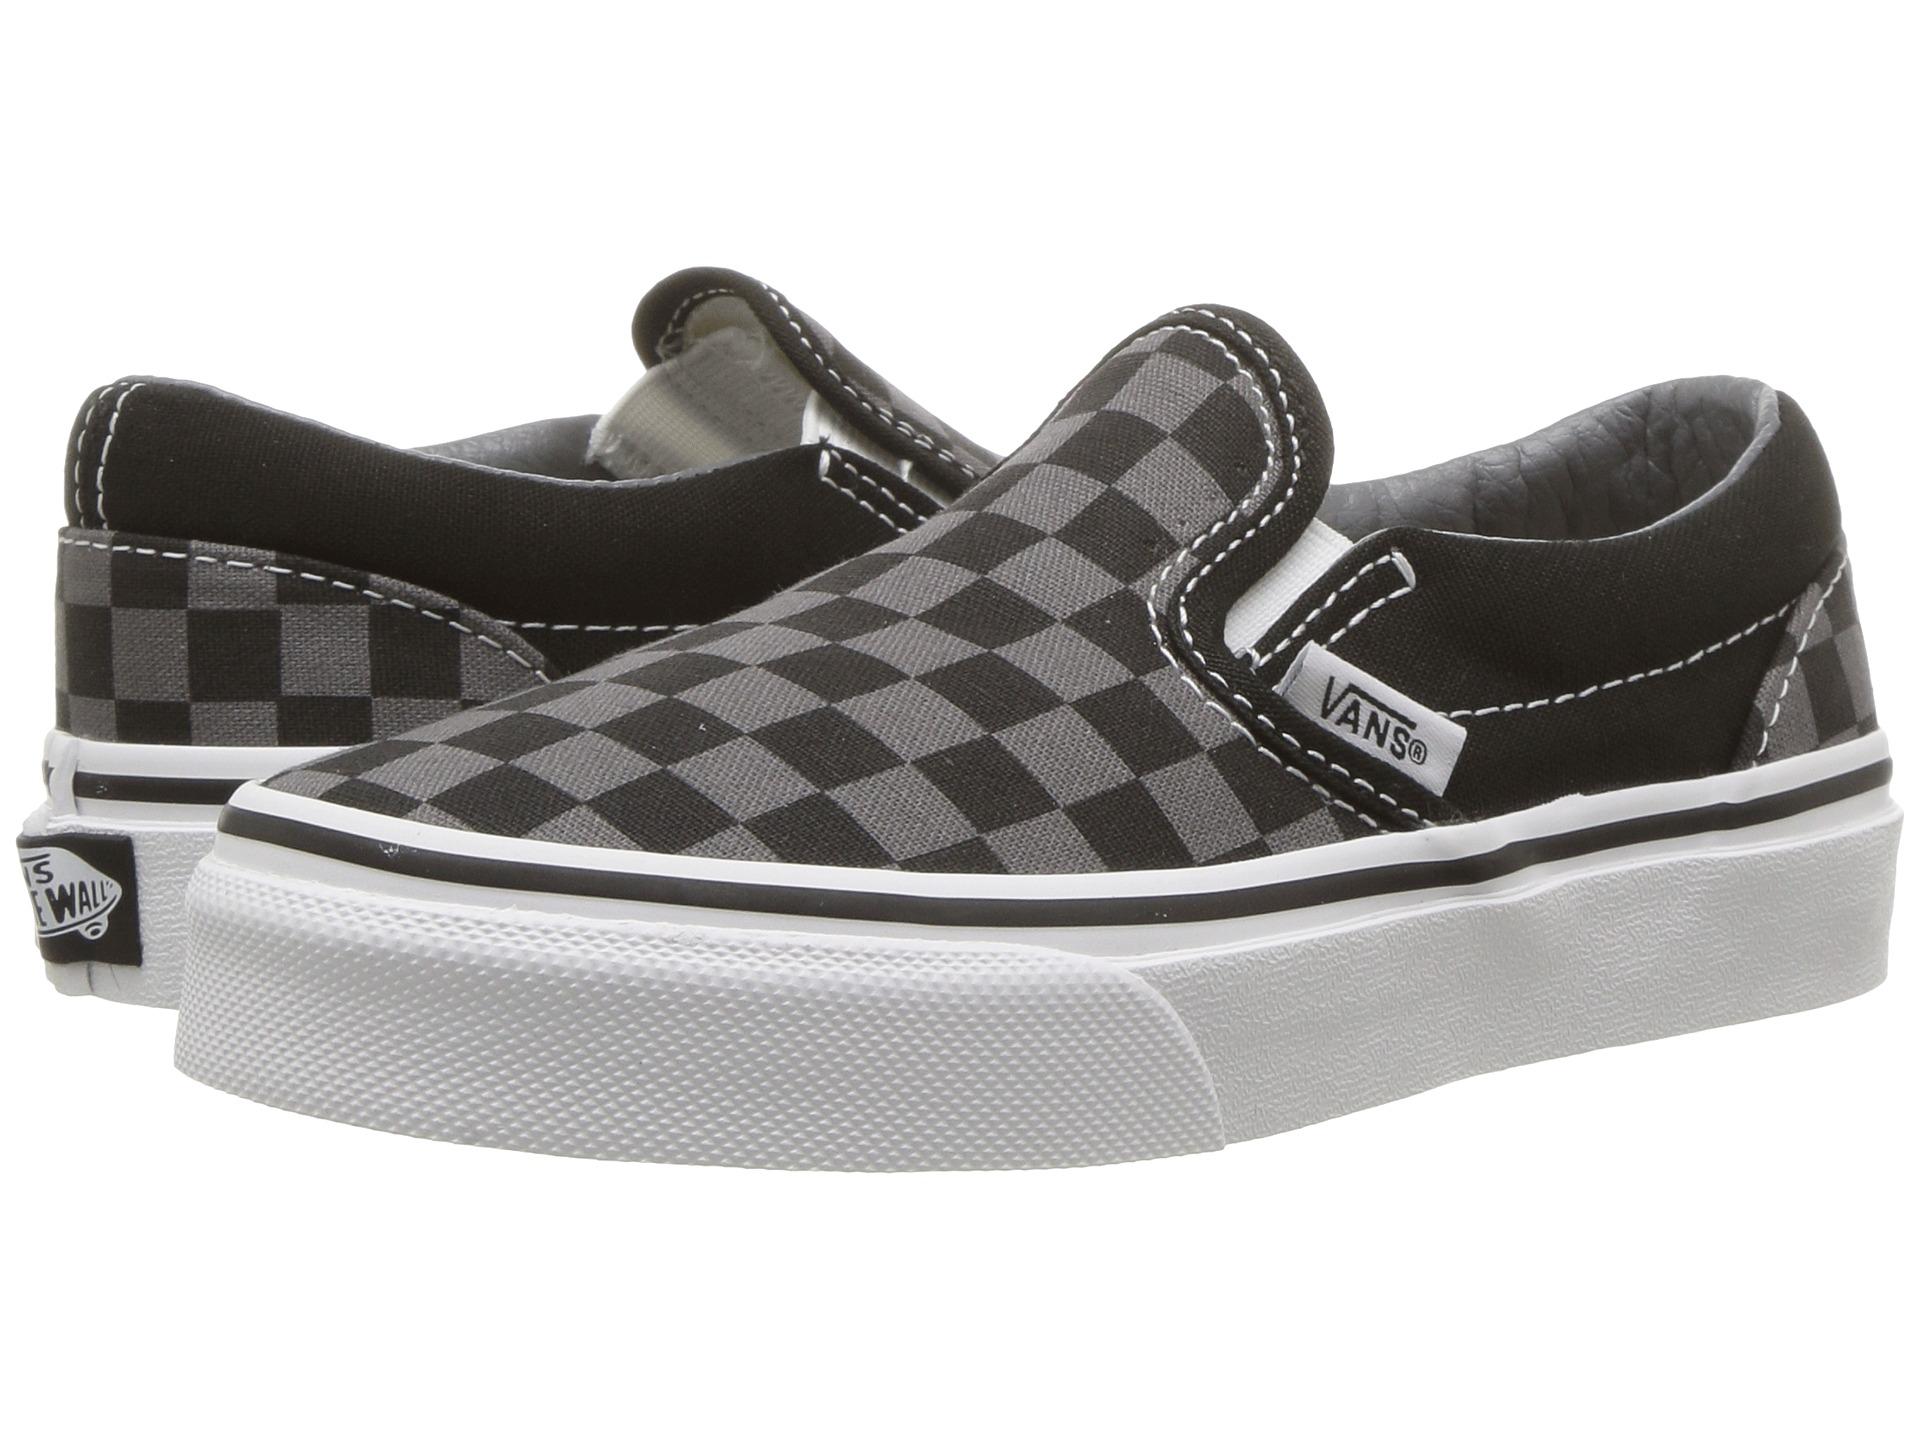 All Black Mens Vans Shoes